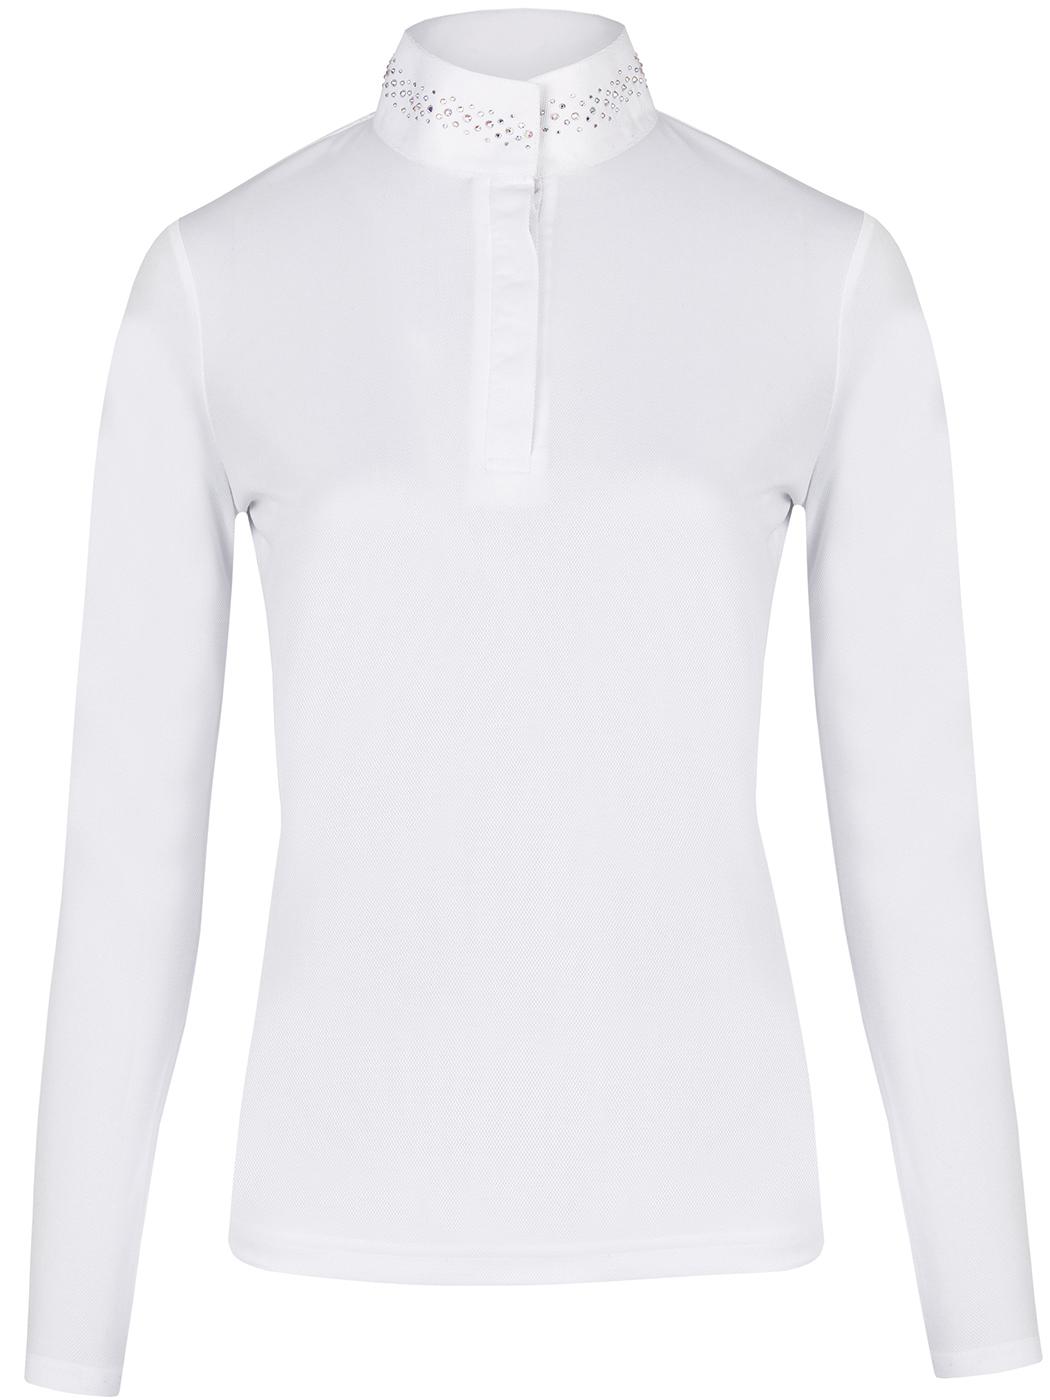 Busse Turnier-Shirt CADIZ, Langarm